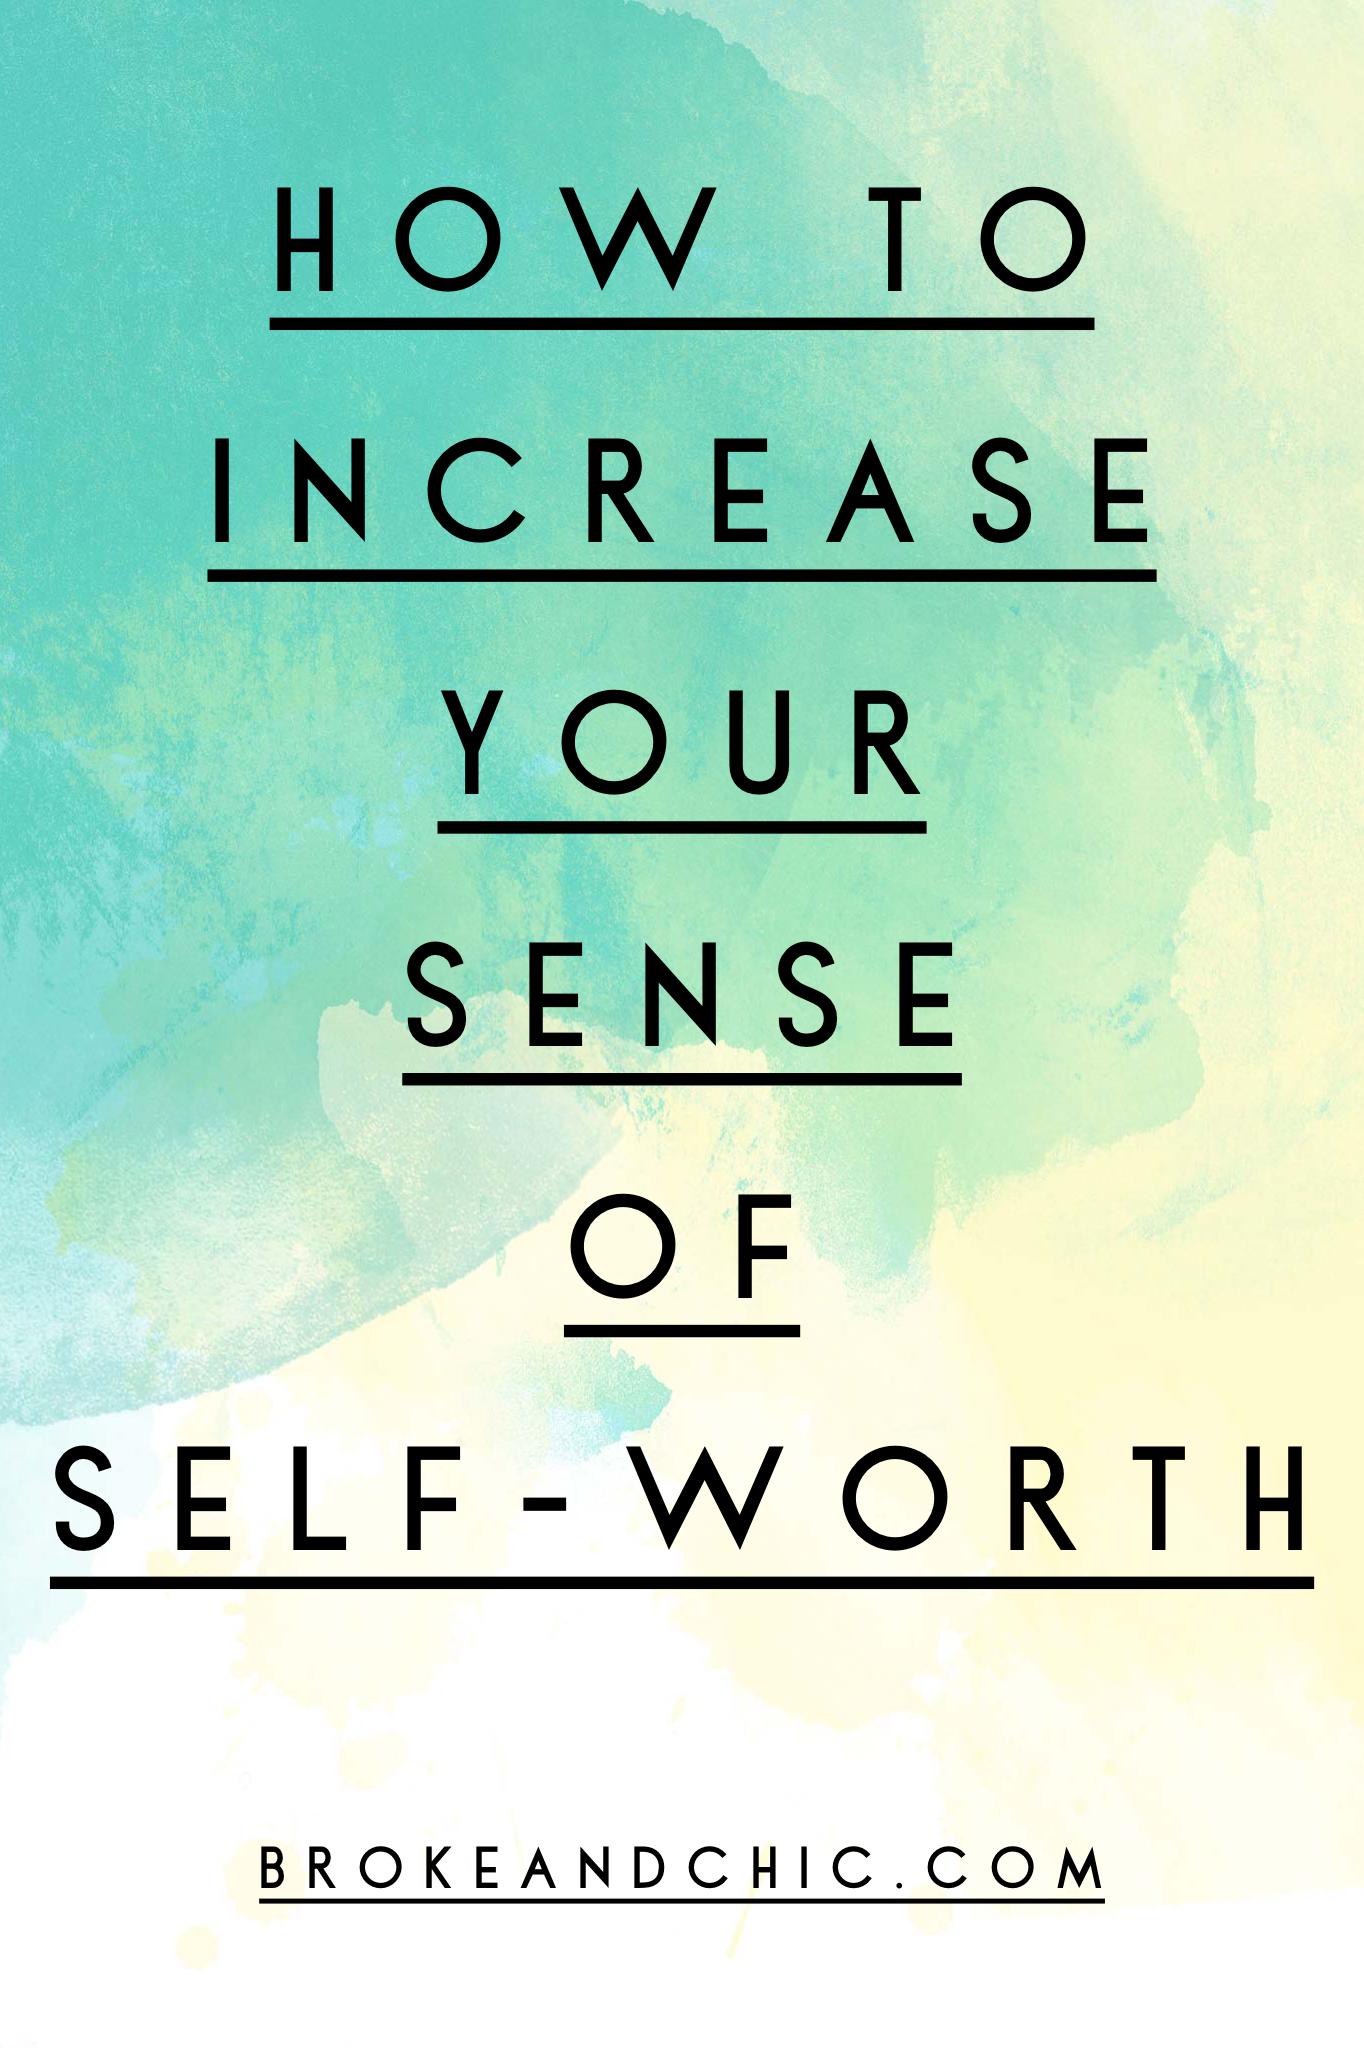 self-worth tips